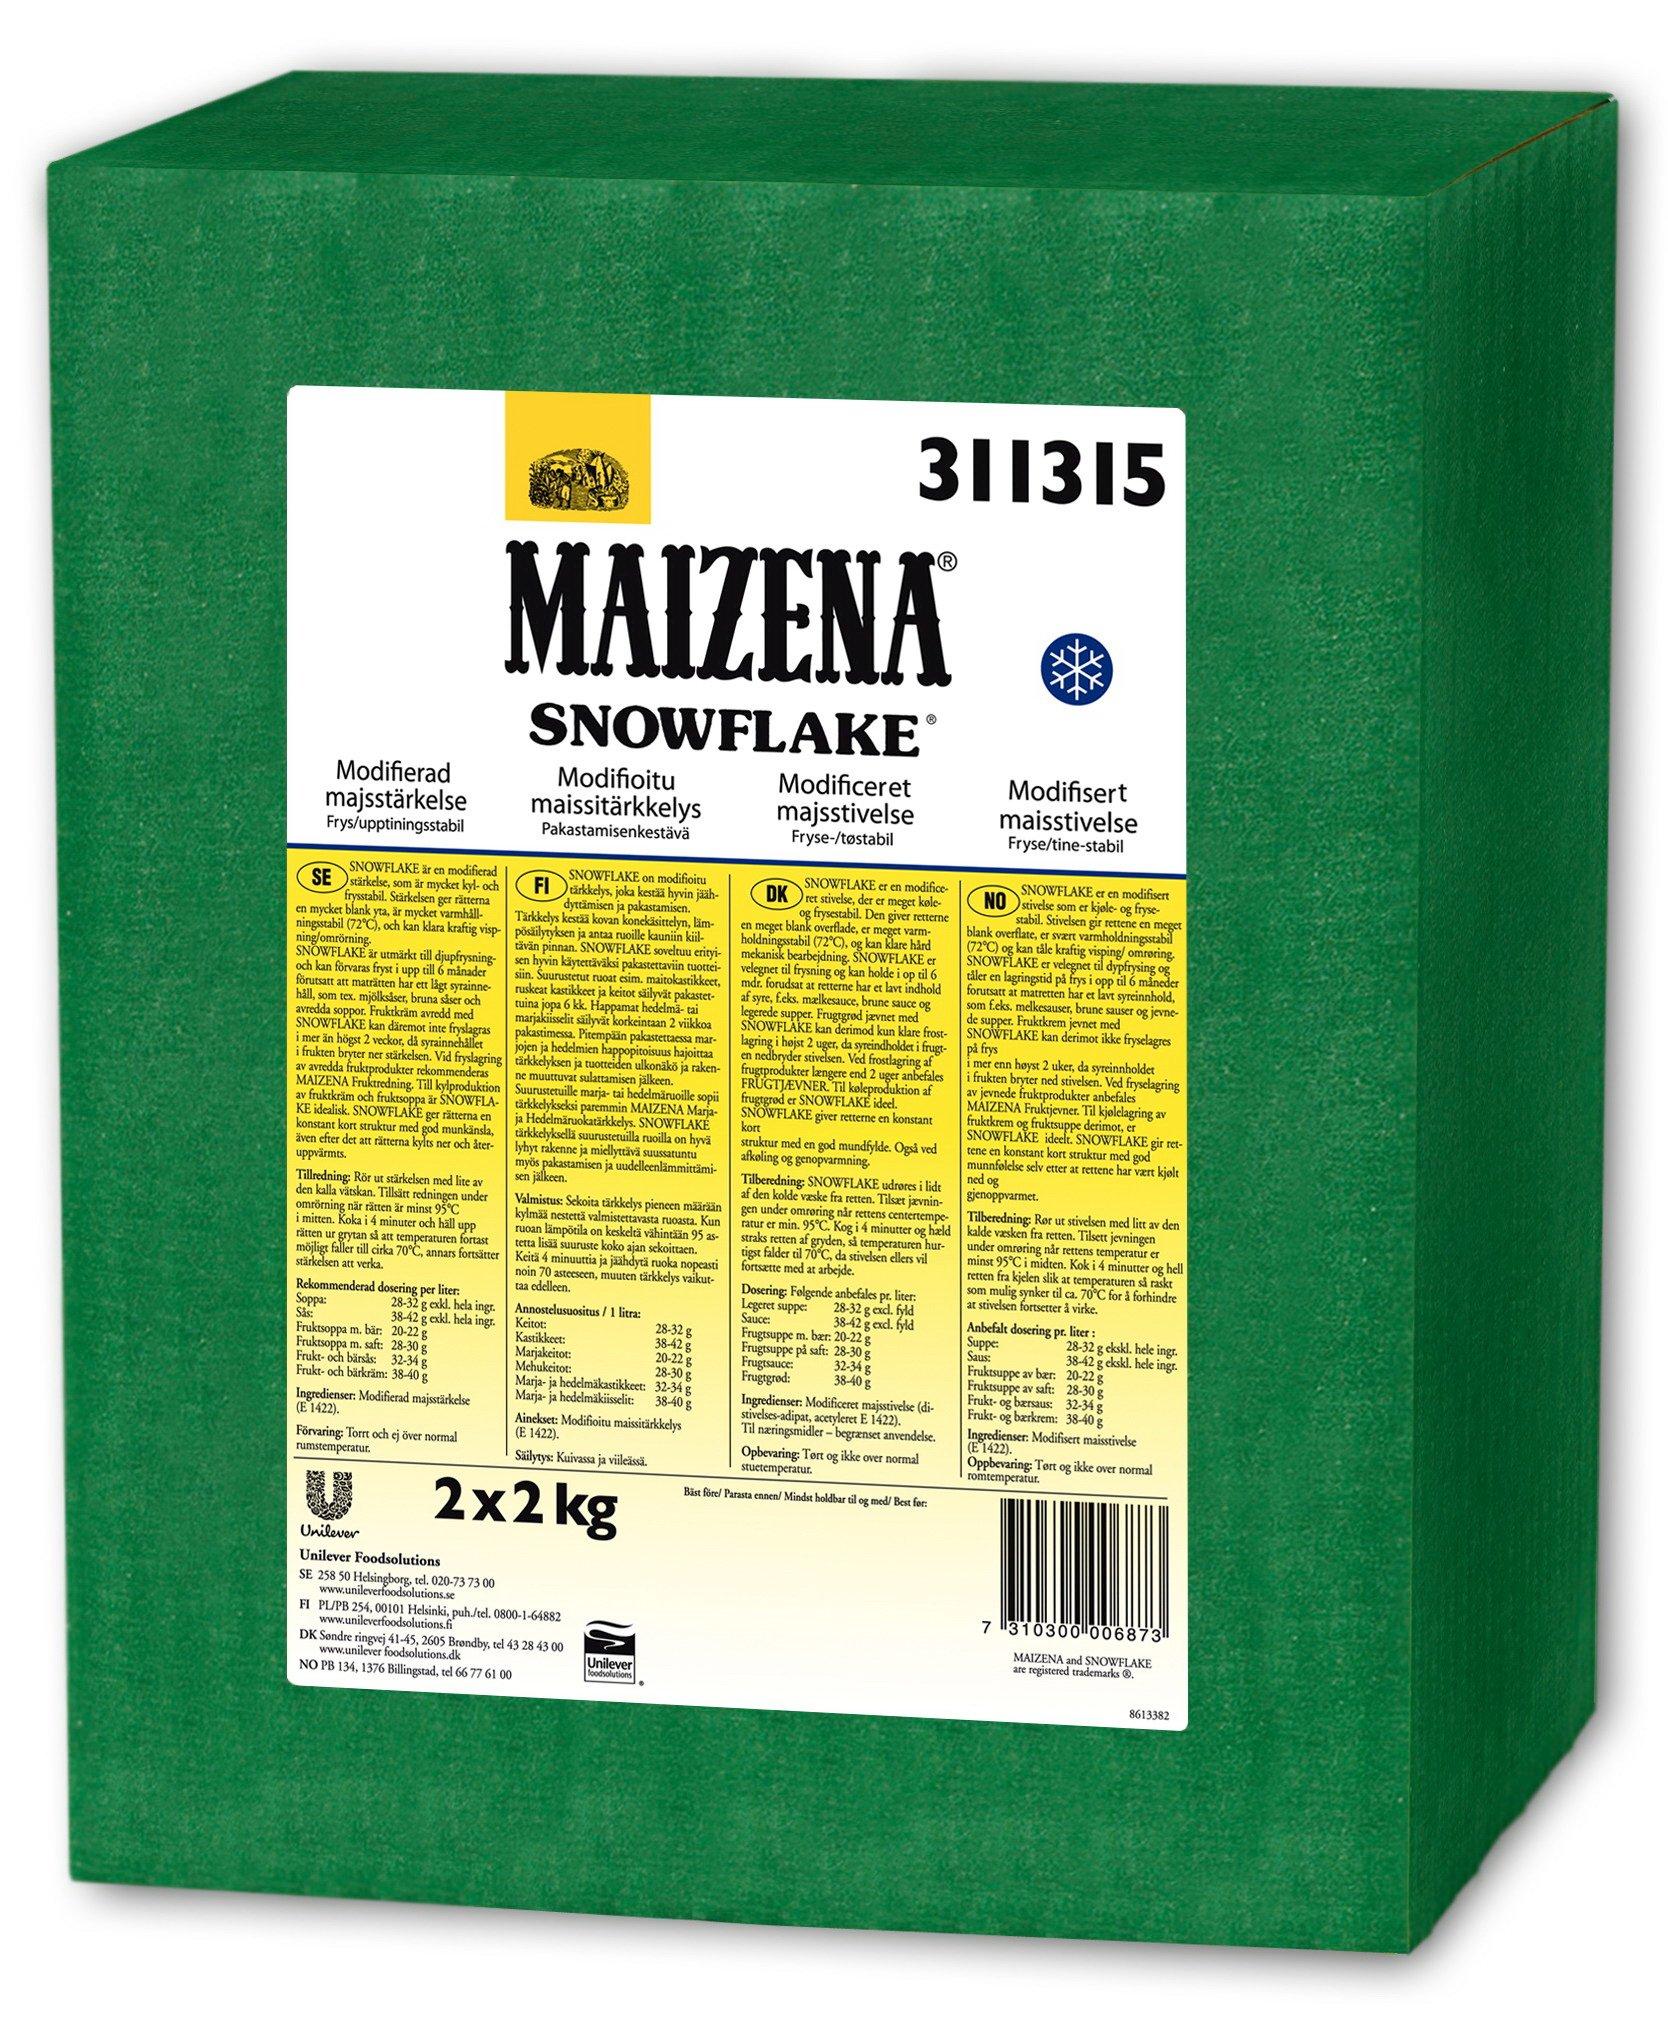 SNOWFLAKE, Modificeret stivelse 2 x 2 kg